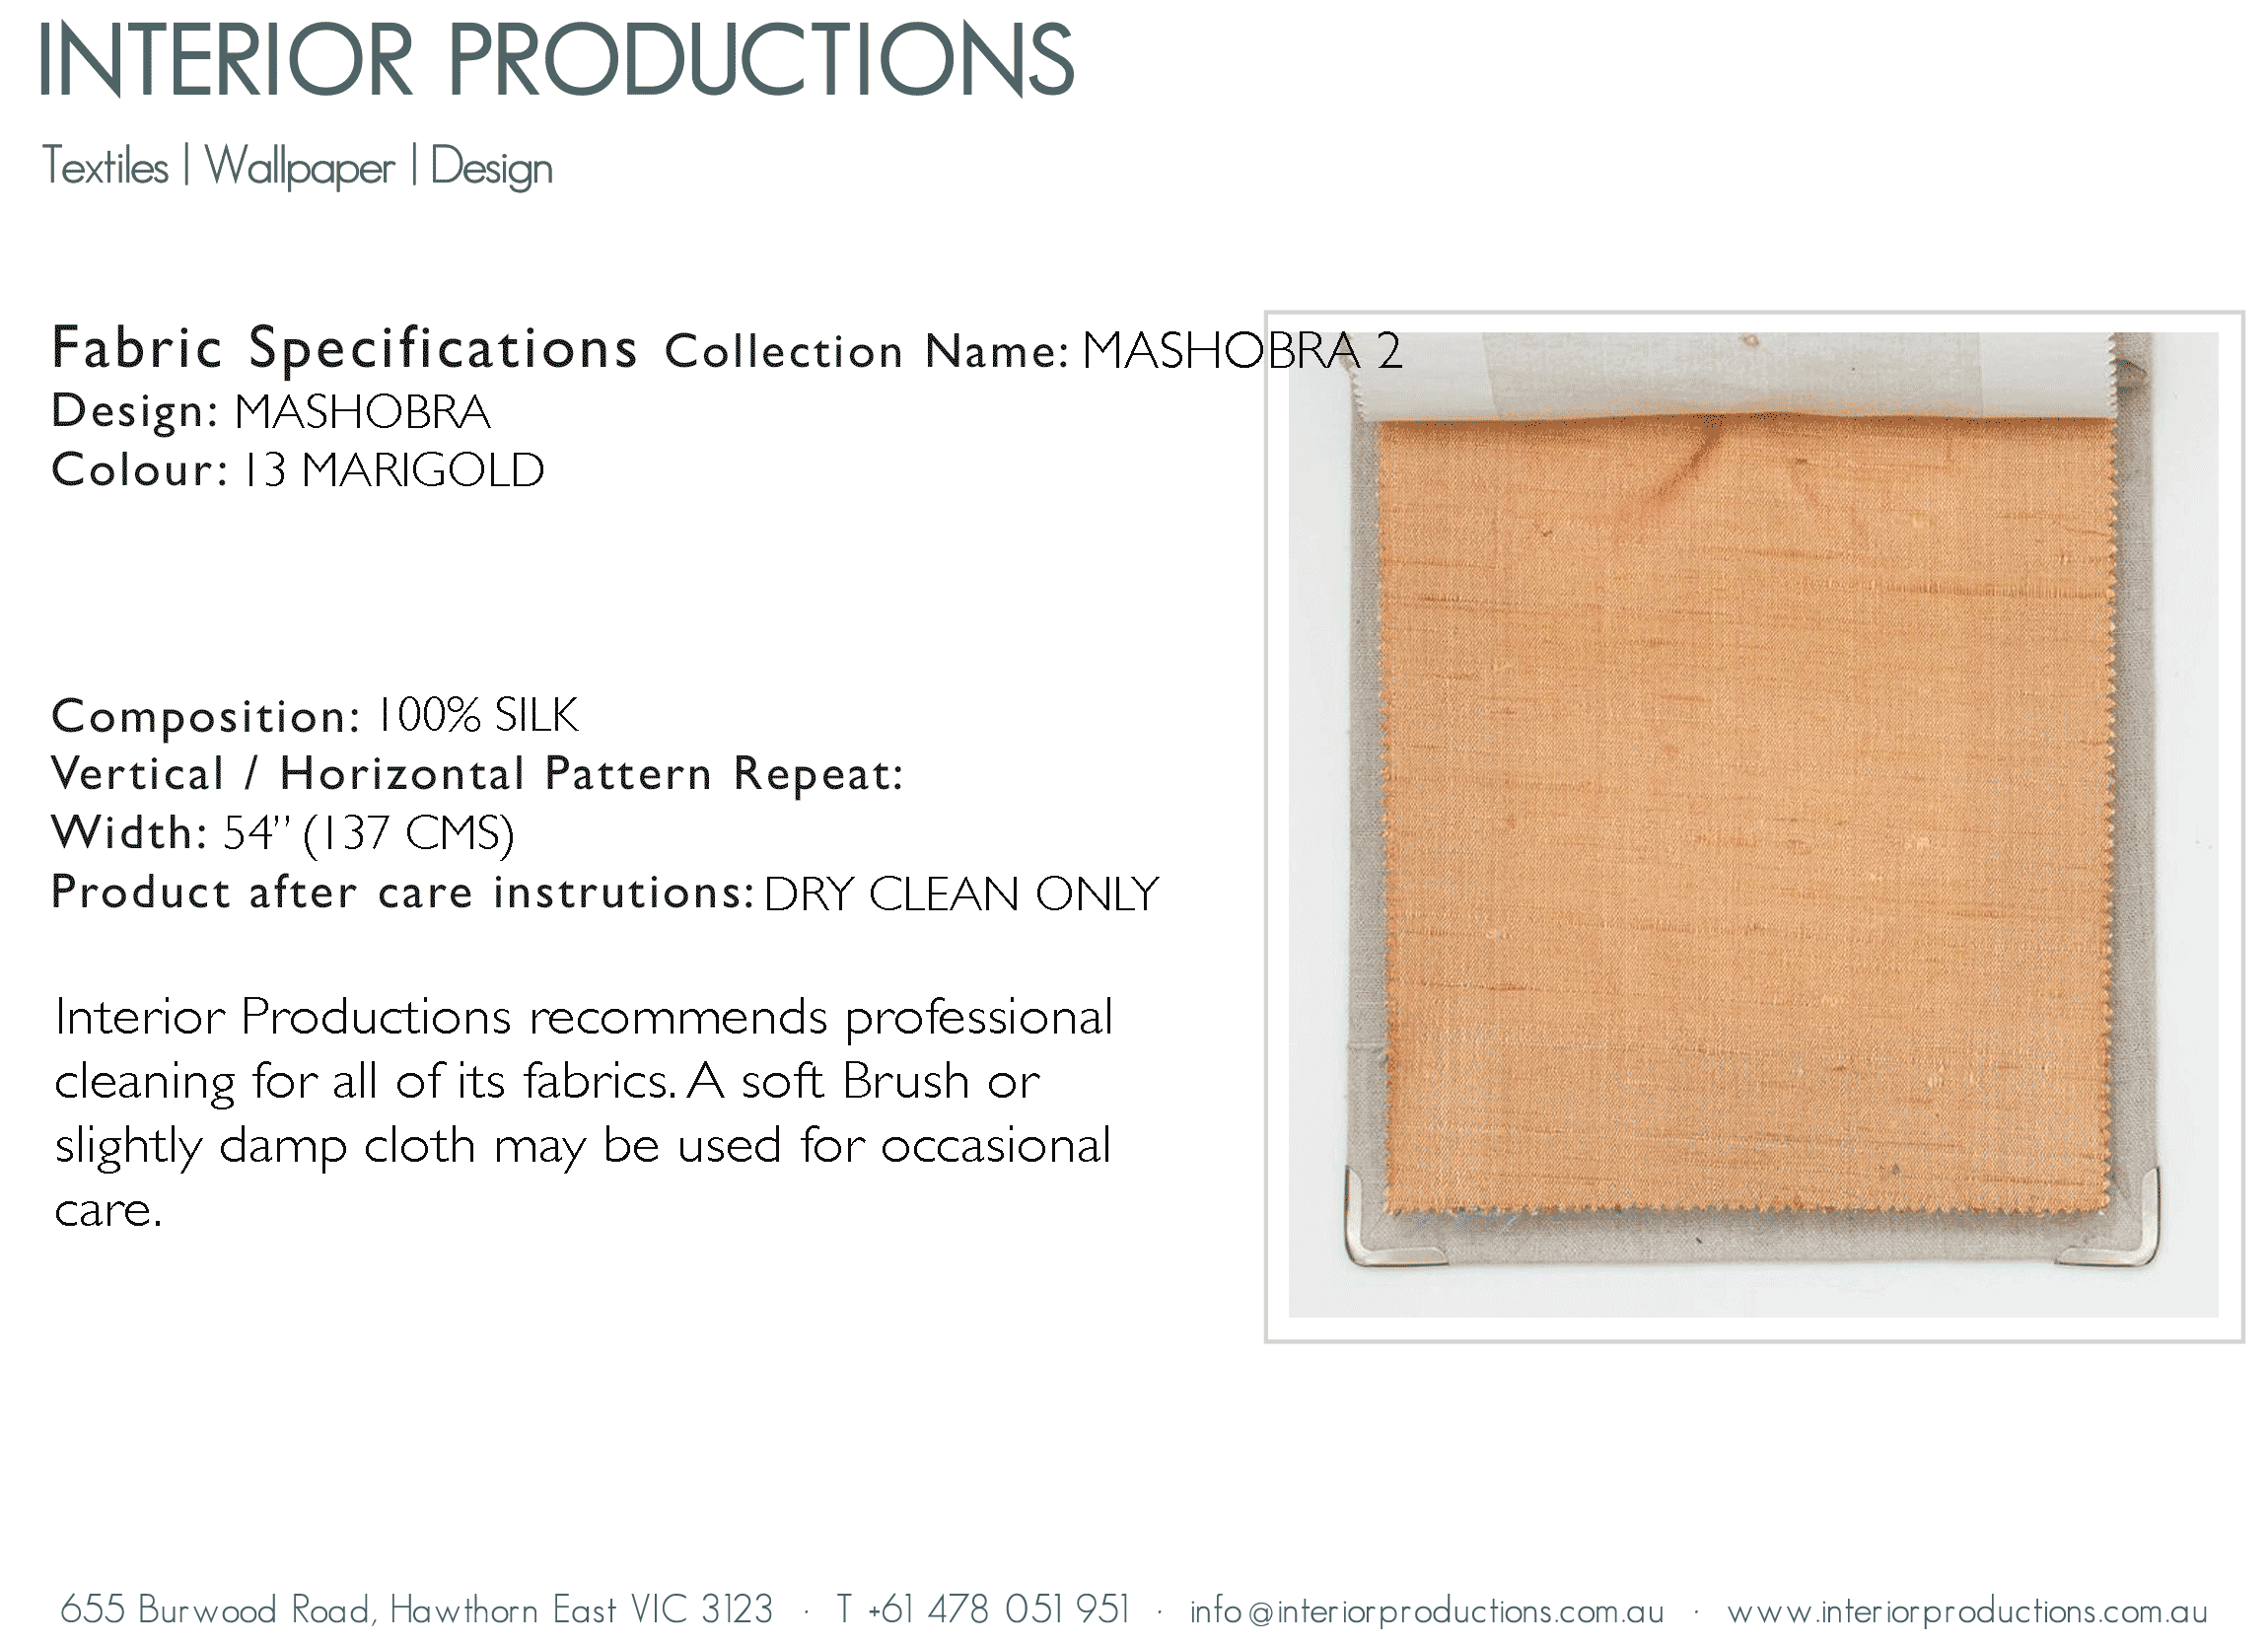 interior_productions_MASHOBRA---13-MARIGOLD